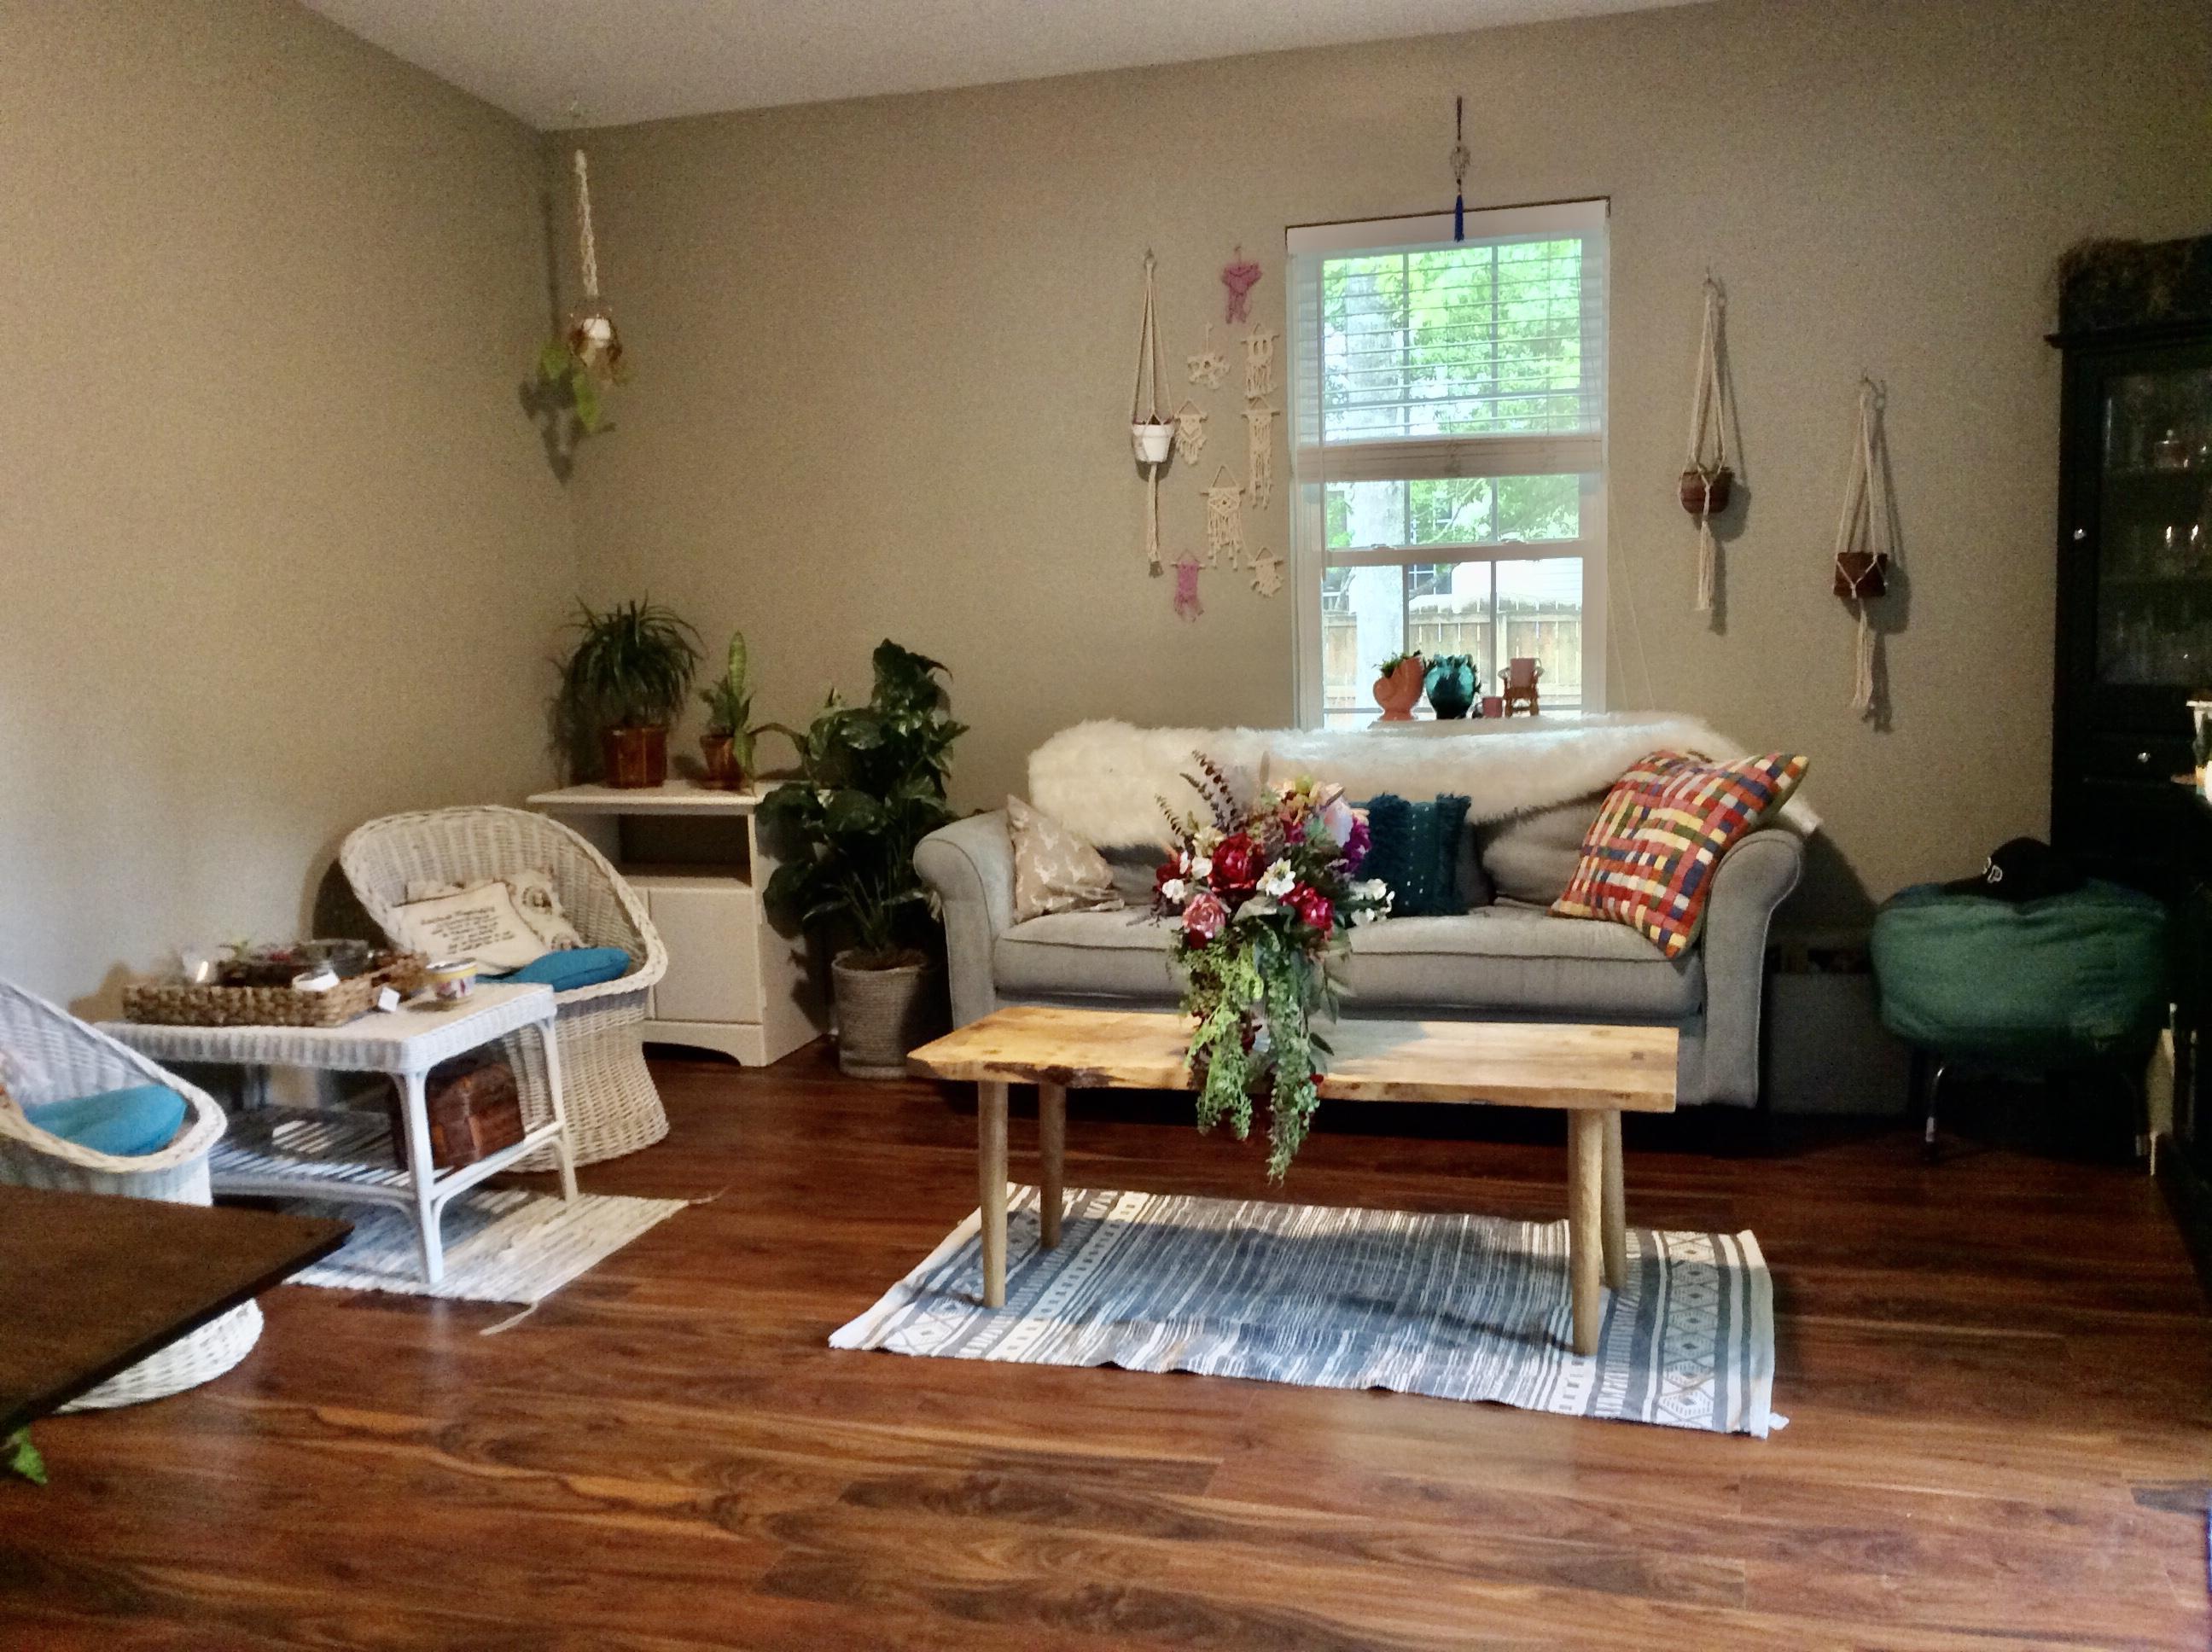 Planters Pointe Homes For Sale - 2616 Turben, Mount Pleasant, SC - 2